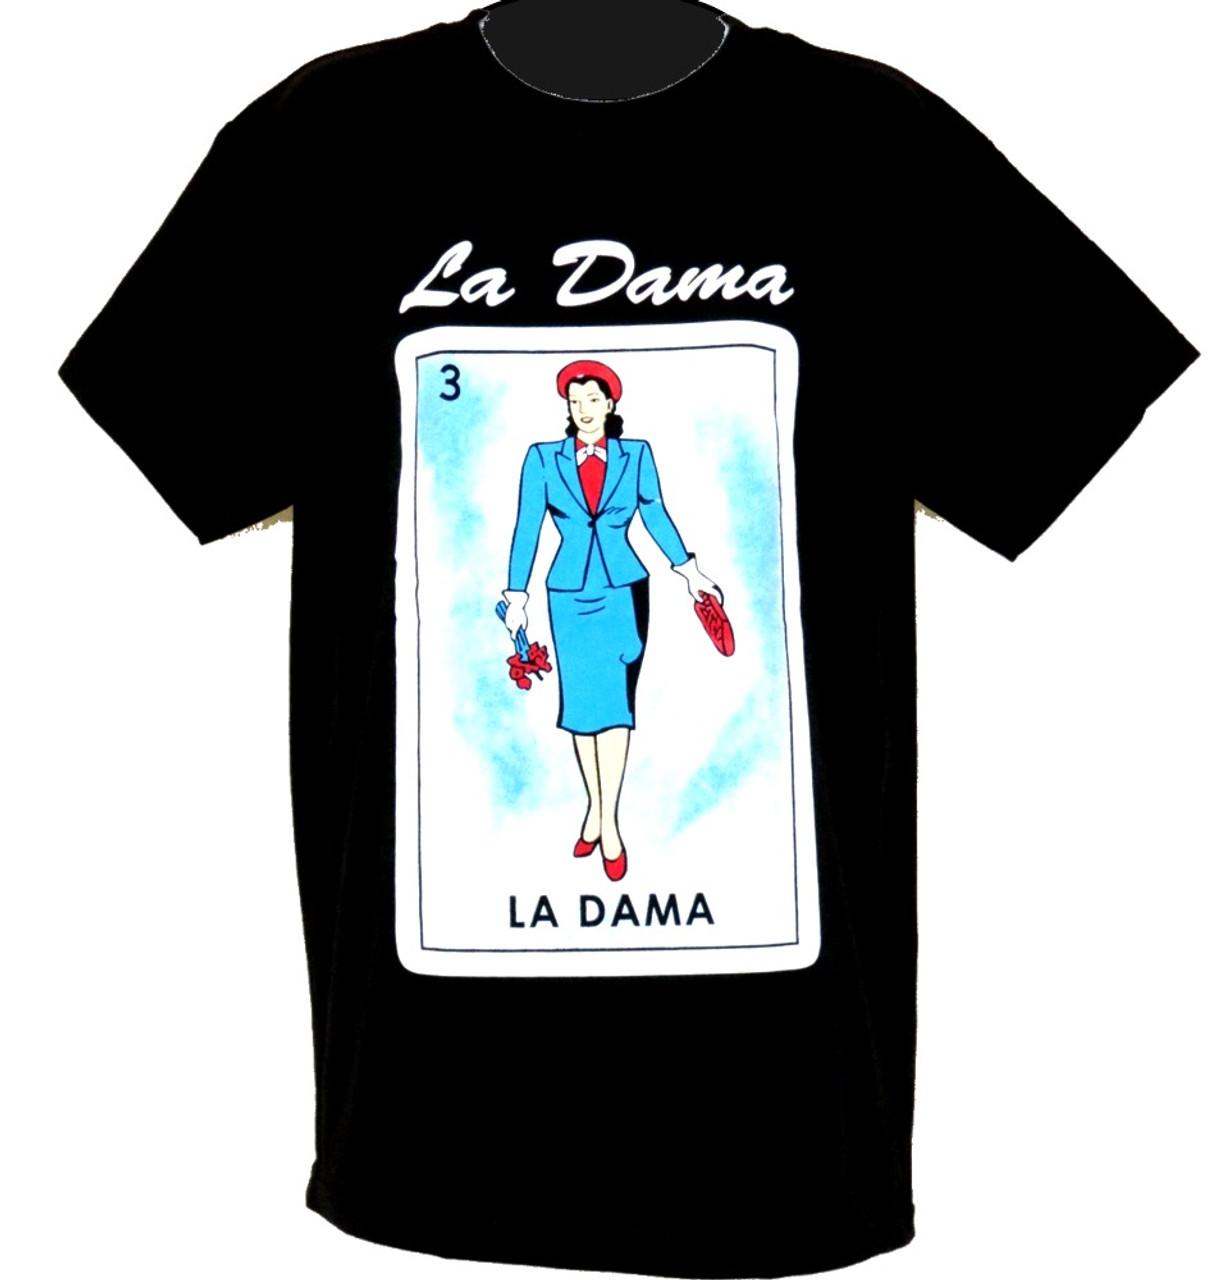 d1e7f4a3 Mexican Loteria T Shirts Cotton Funny Shirts La Dama